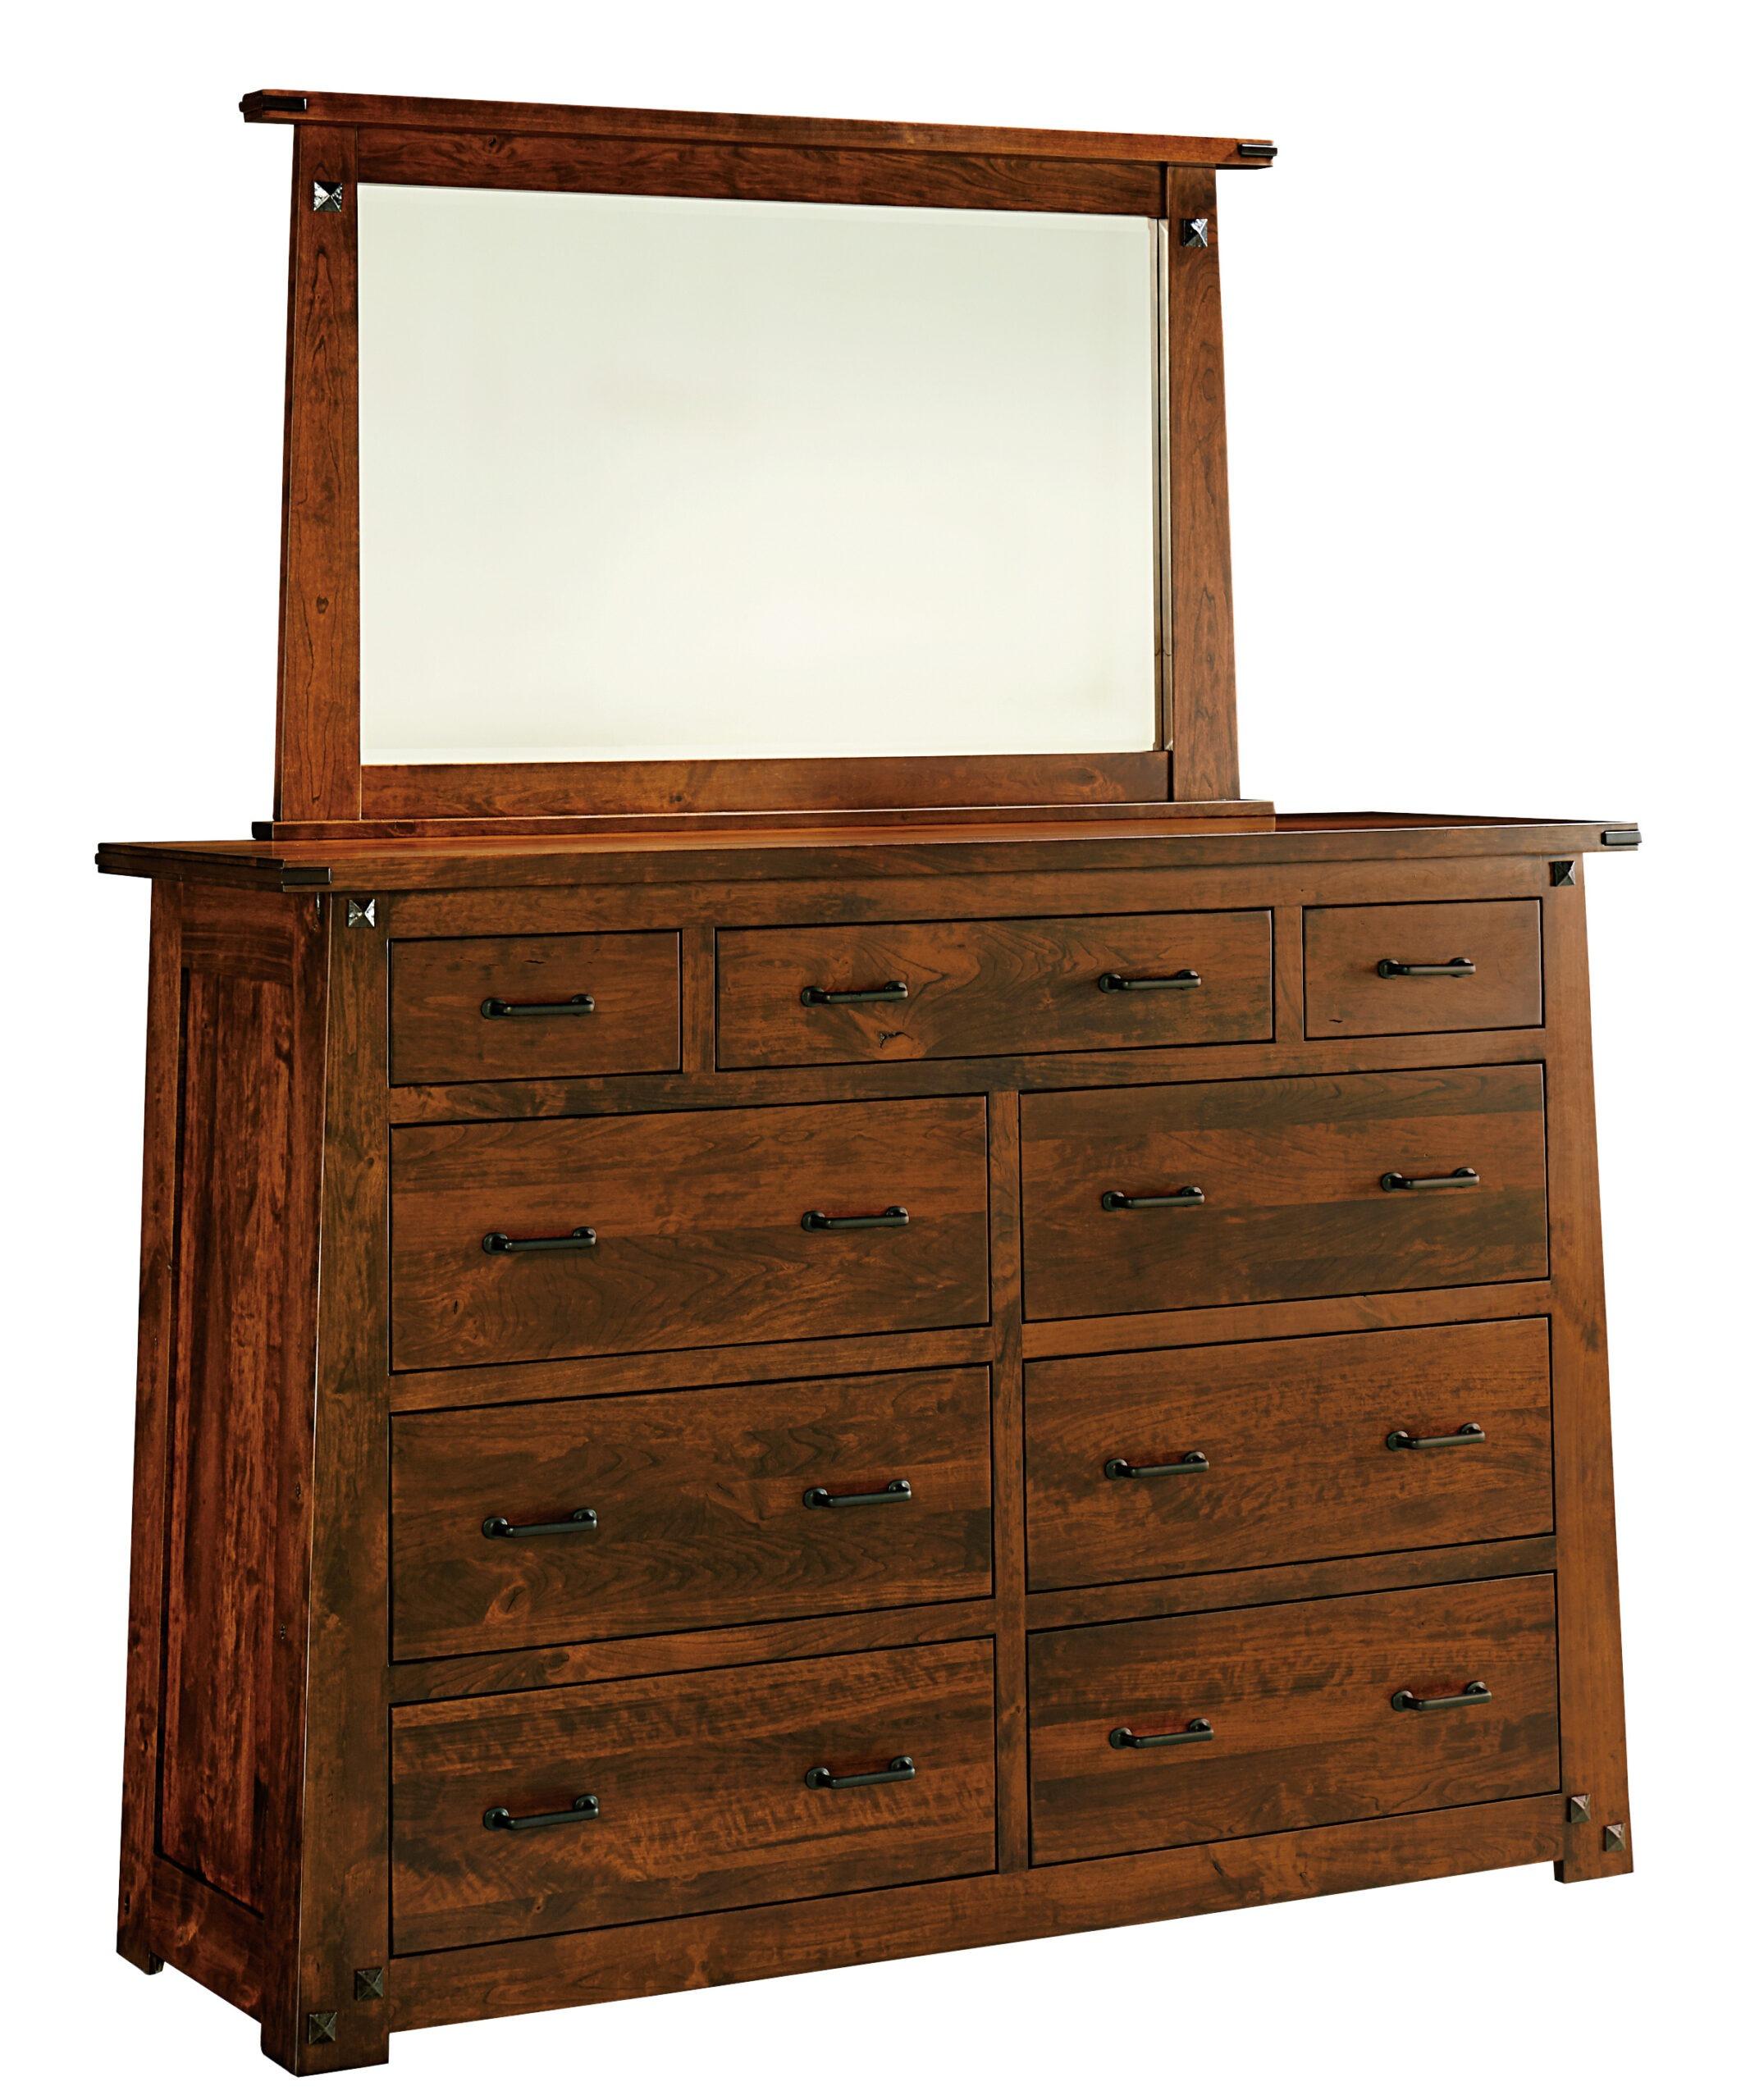 Encada 9 Drawer Dresser